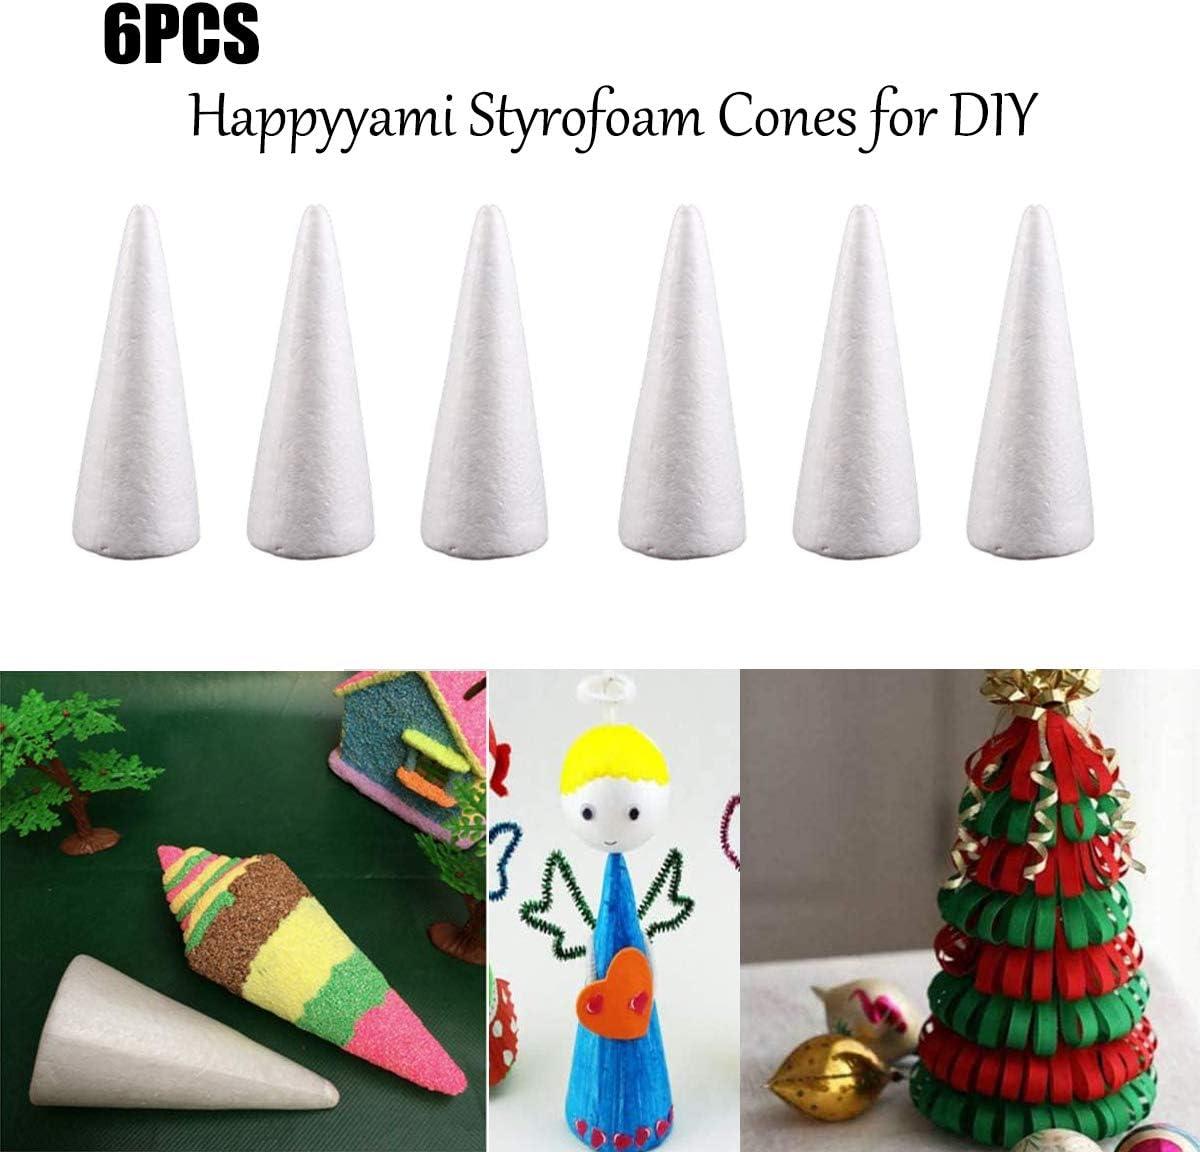 Oopsu 8Pcs White Craft Foam Cone Styrofoam Cones Christmas Tree Table Centerpiece White Creative Styrofoam Cone Shape DIY Craft Party Decoration